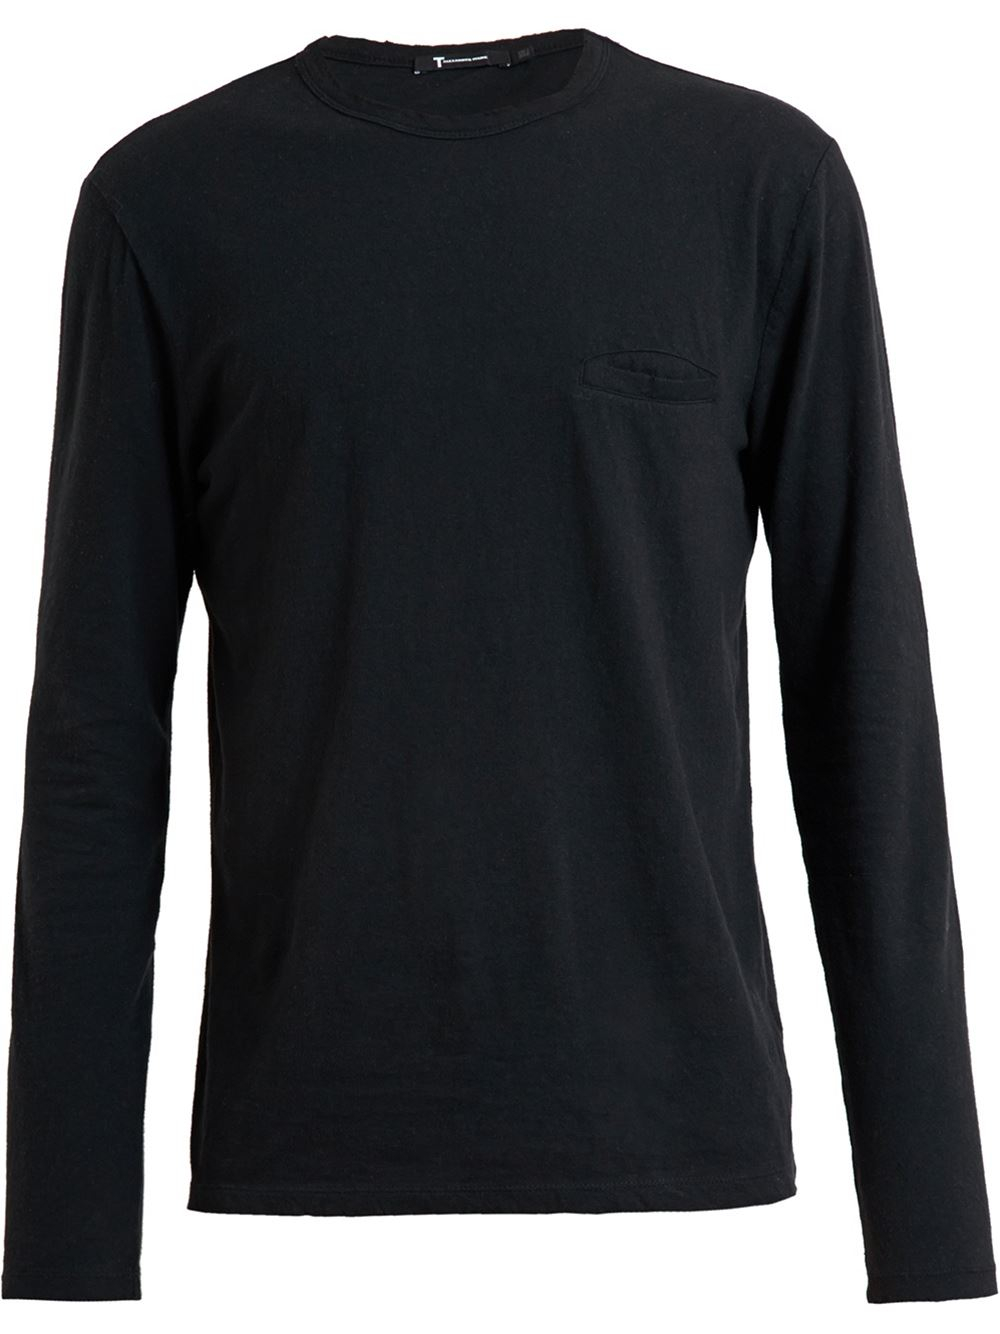 Black t shirt long sleeve - Gallery